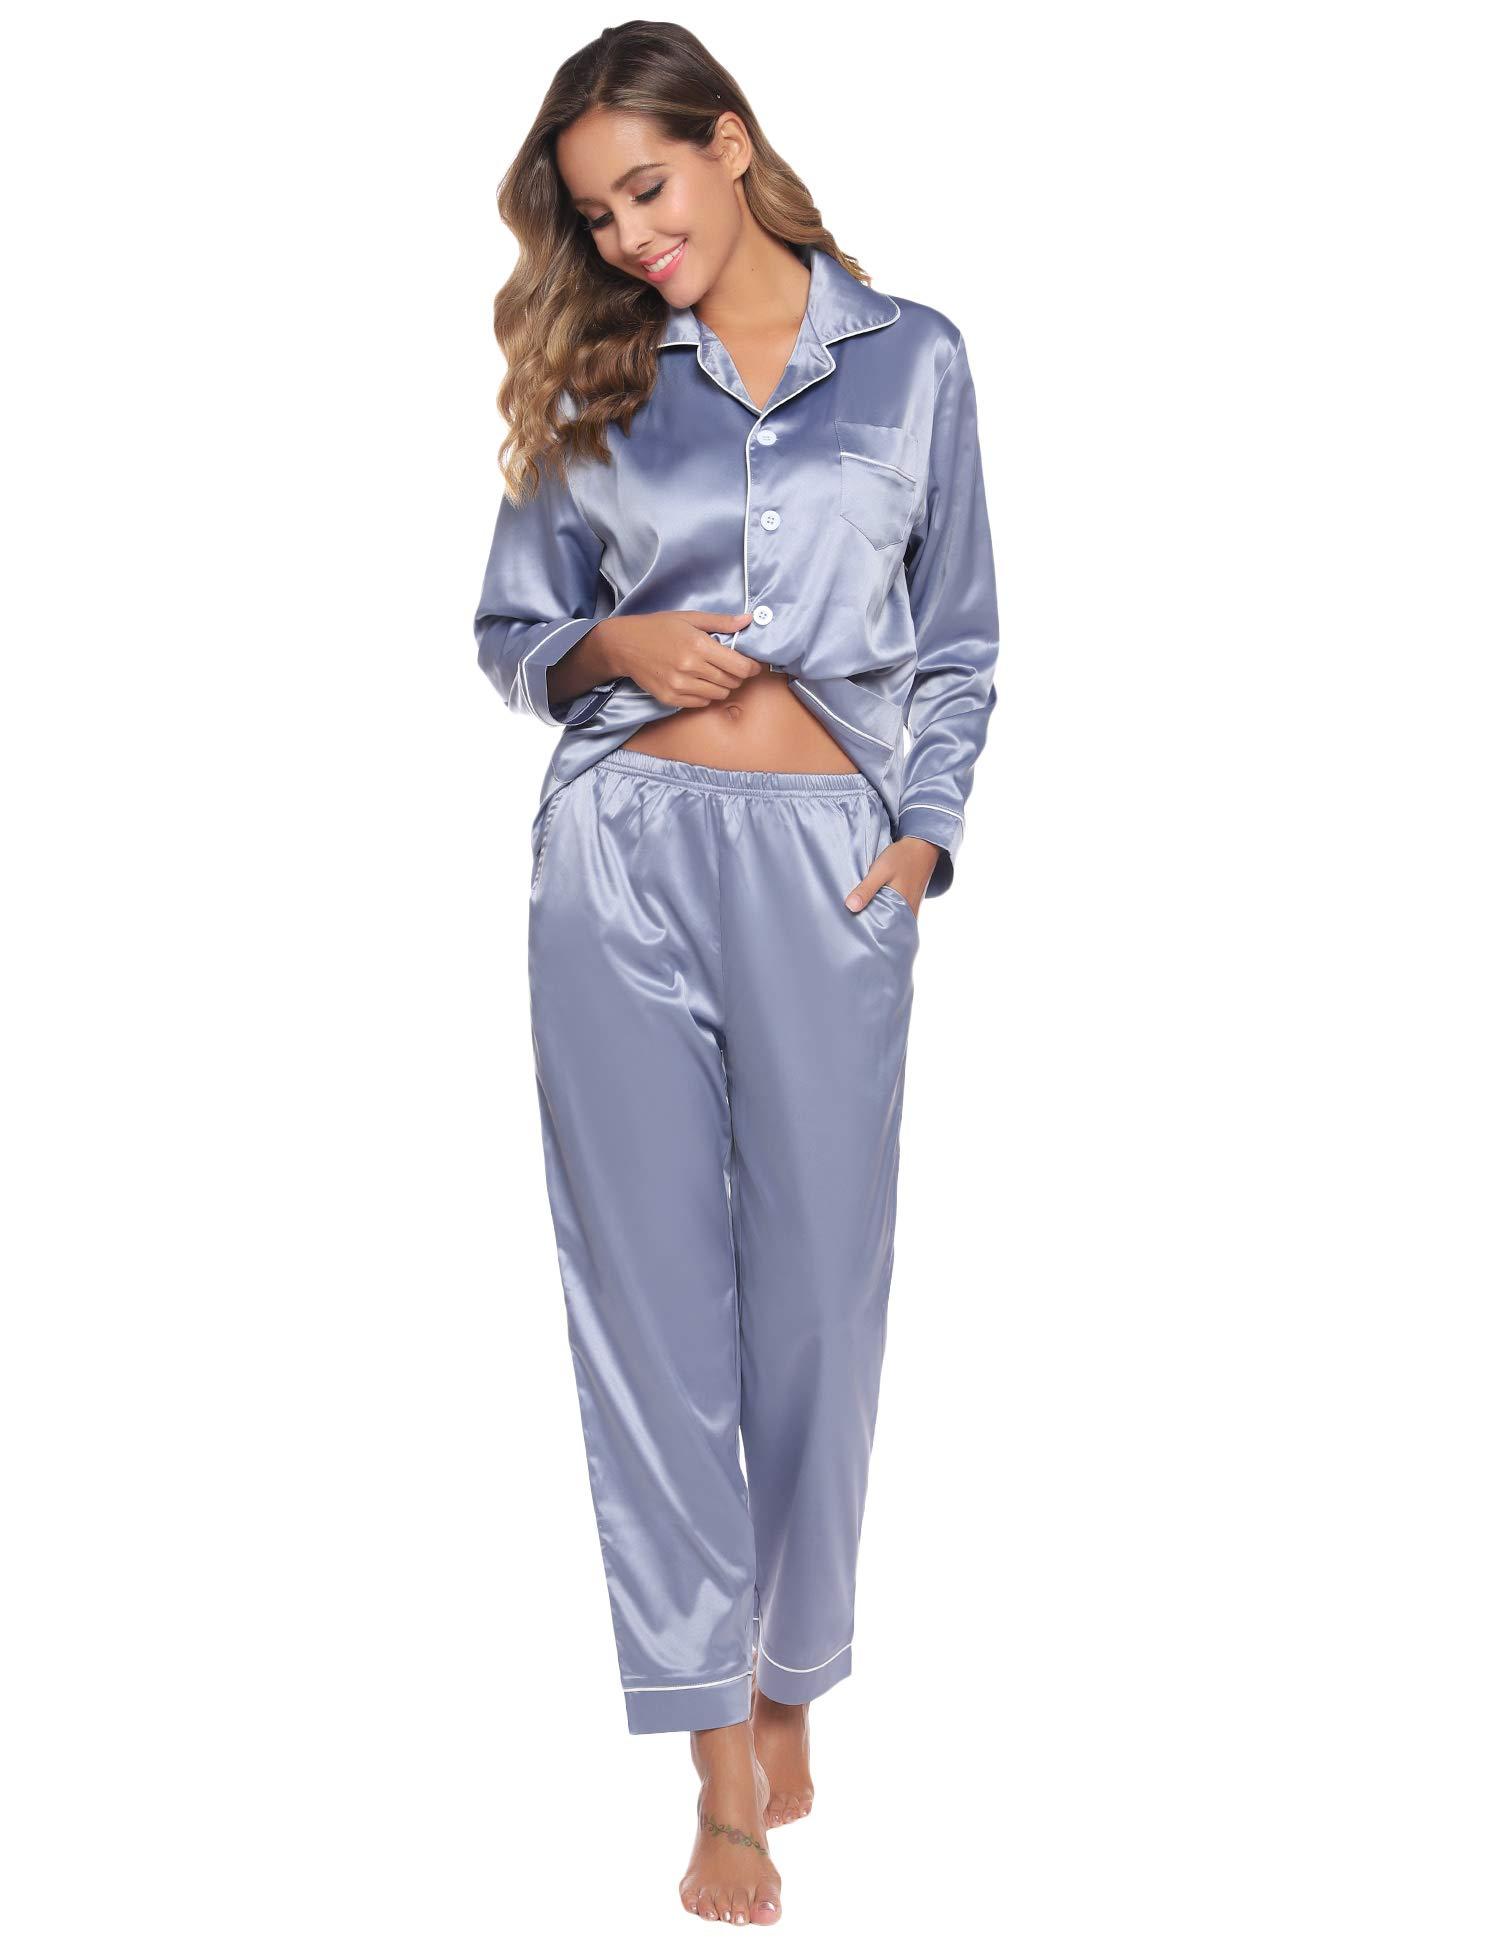 Abollria Women's Pajamas,Satin Nightwear Set,Long Sleeve Button Up Shirt & Pants with Pockets Ladies Sleepwear Silky Loungewear S~2XL